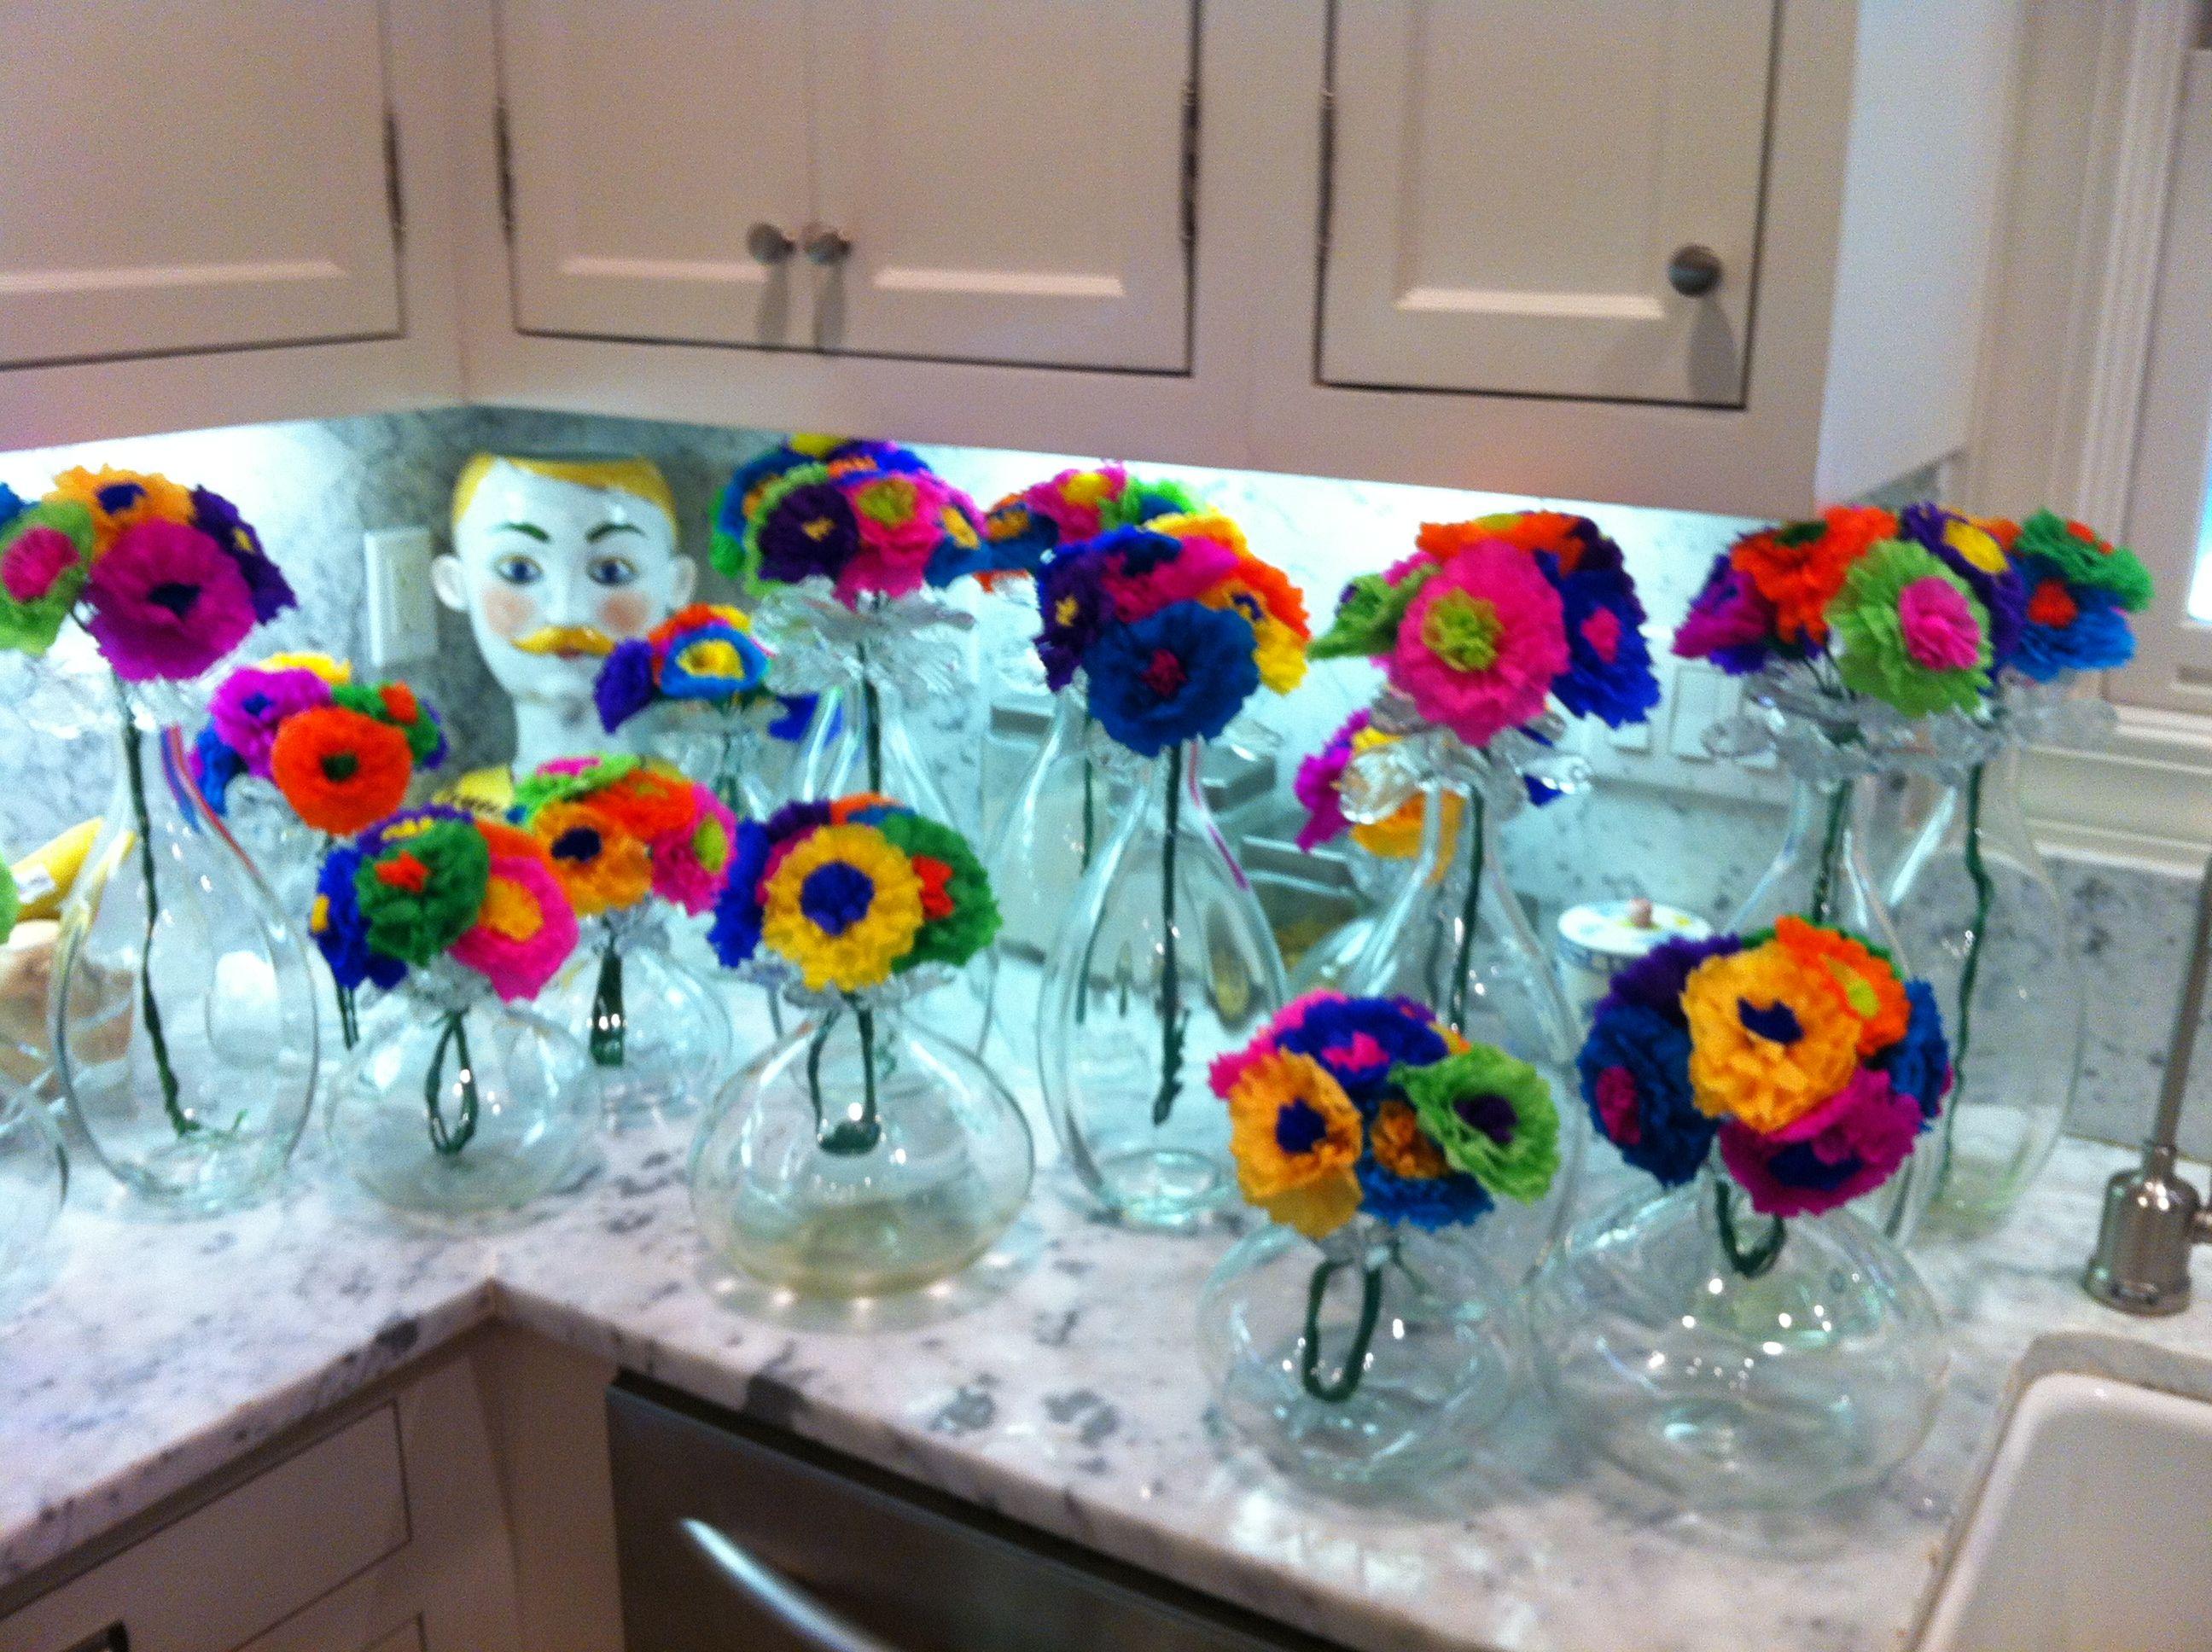 Cinco de mayo flowers party ideas pinterest for 5 de mayo party decoration